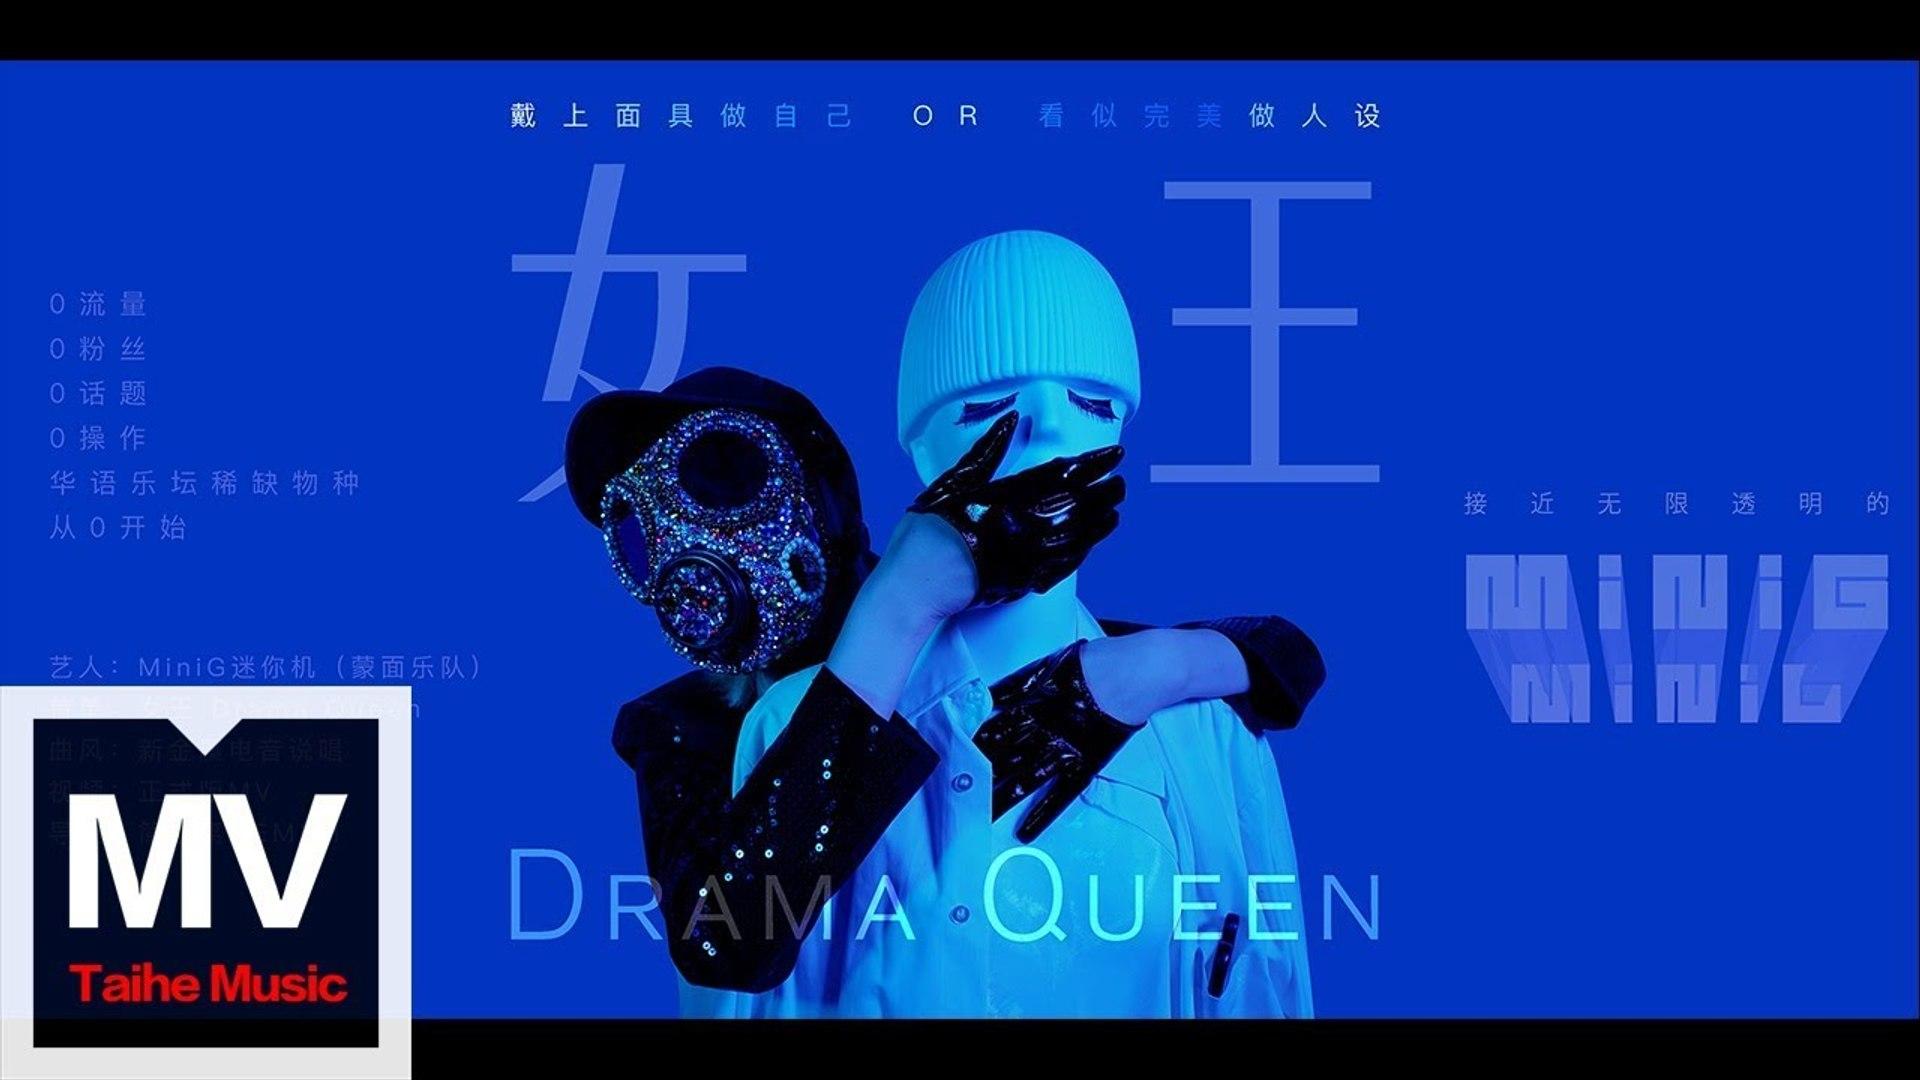 MiniG 迷你機【女王 Drama Queen】HD 高清官方完整版 MV